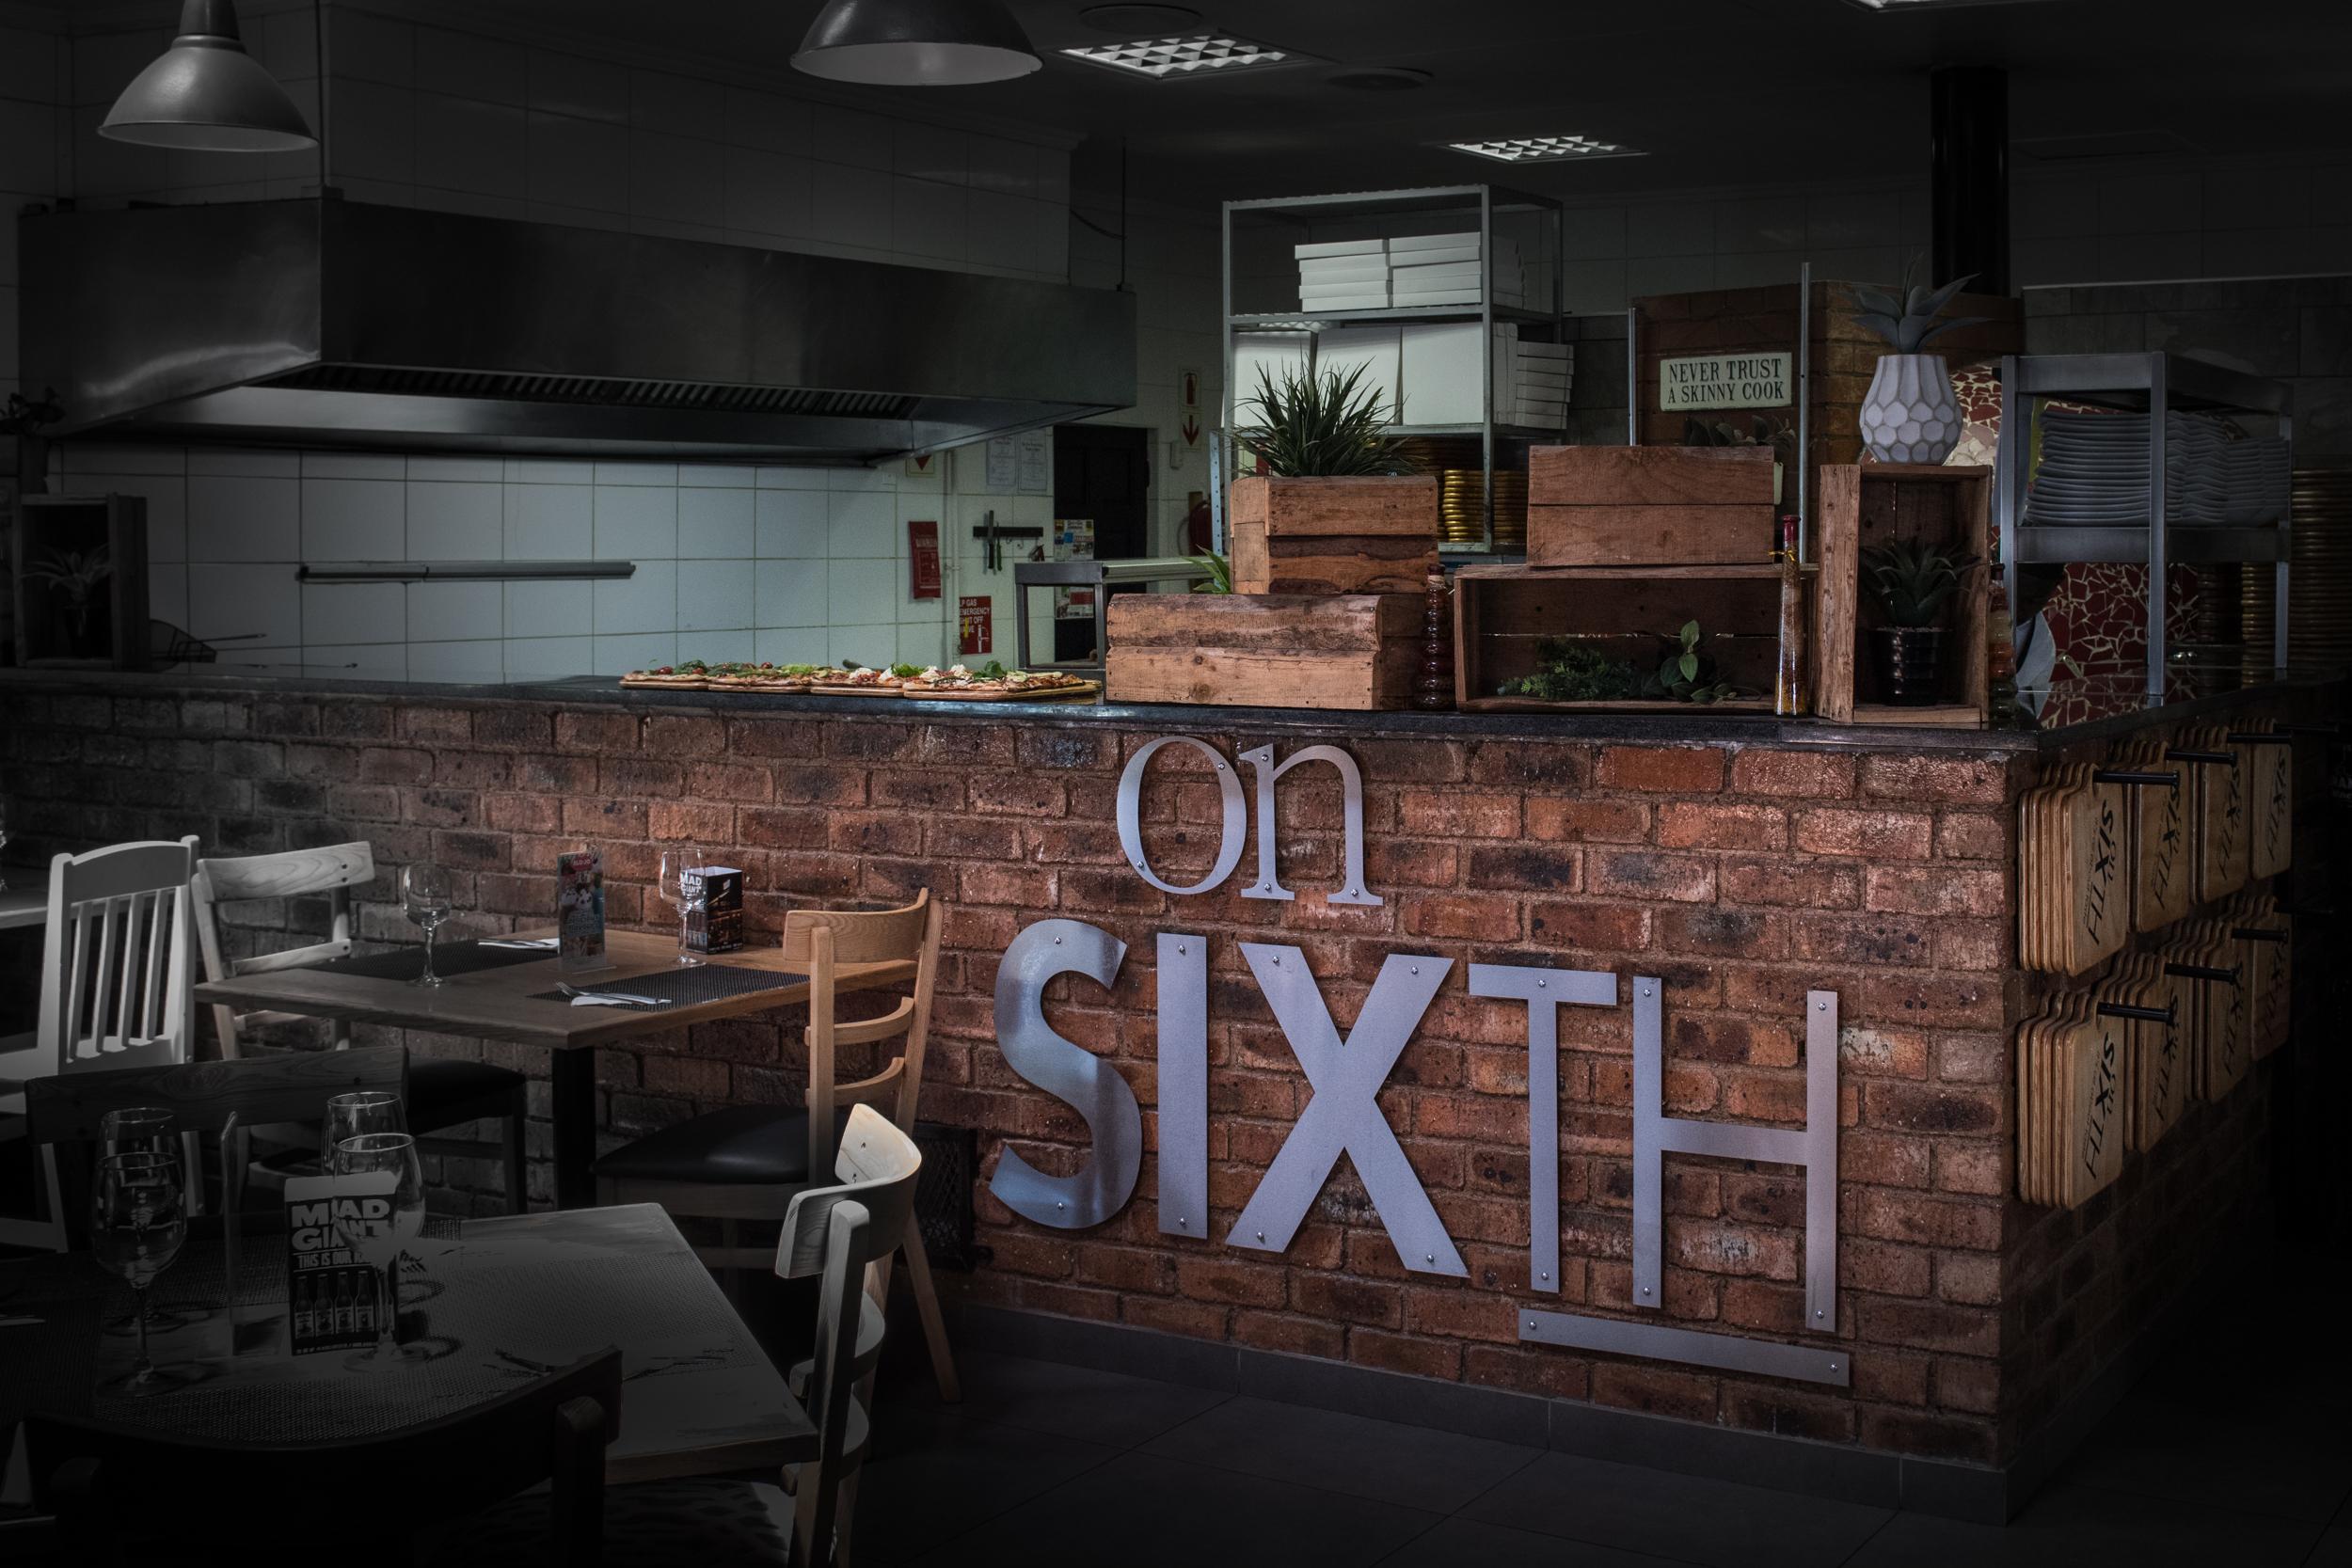 OnSixth-58.jpg